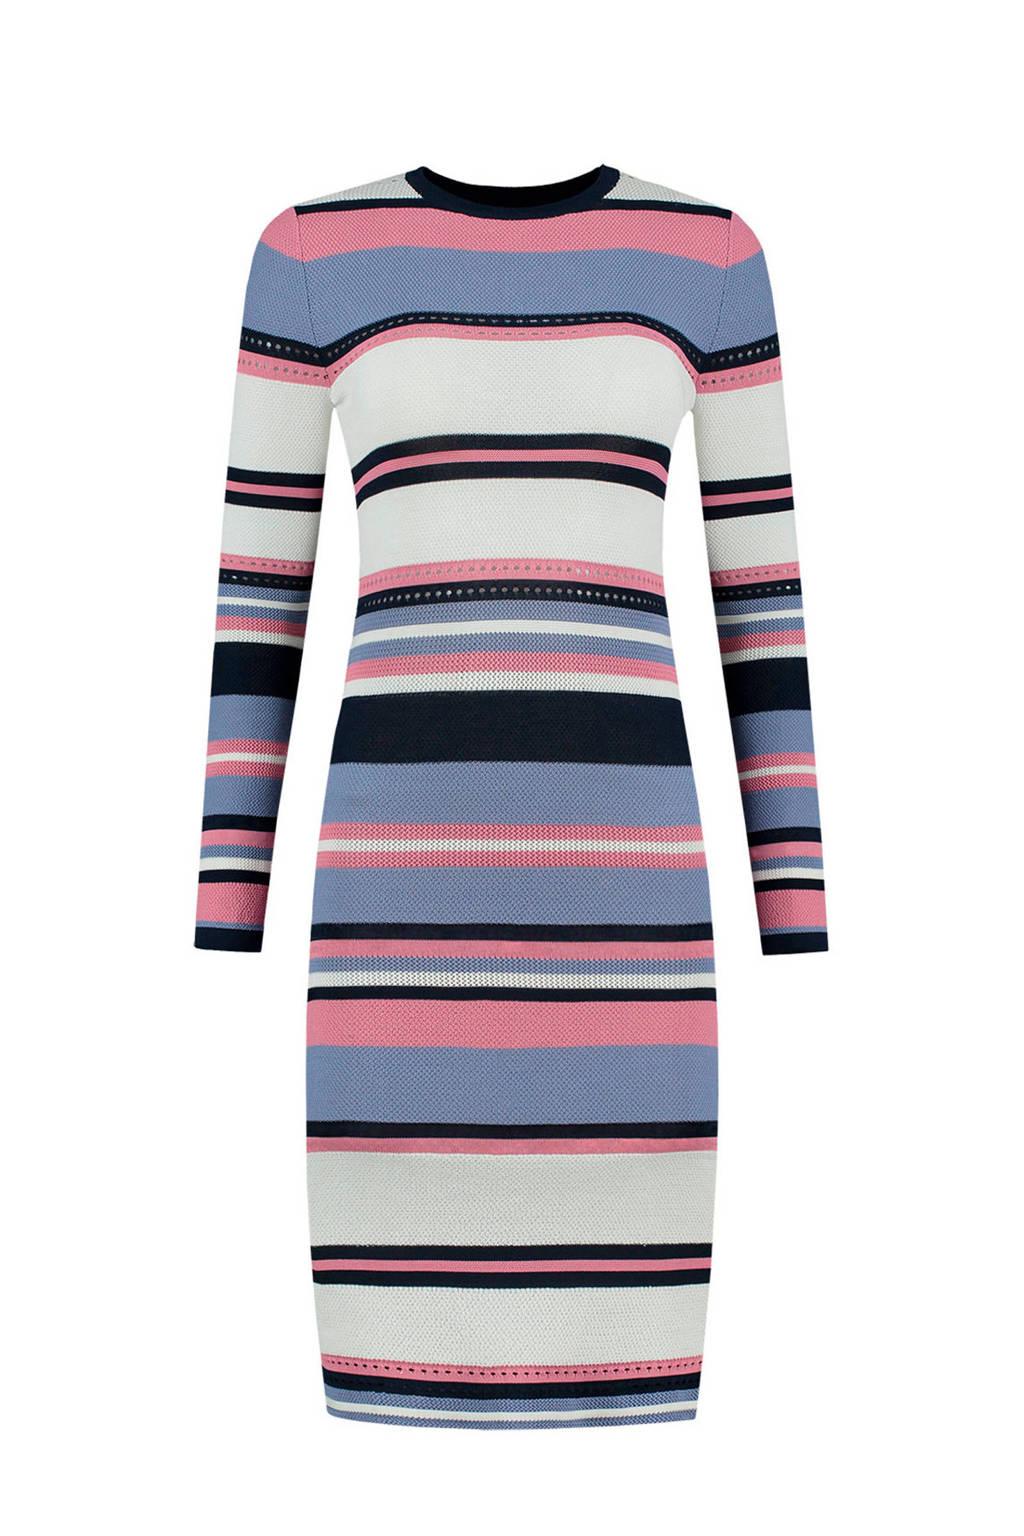 NIKKIE gestreepte jurk, Blauw/roze/zwart